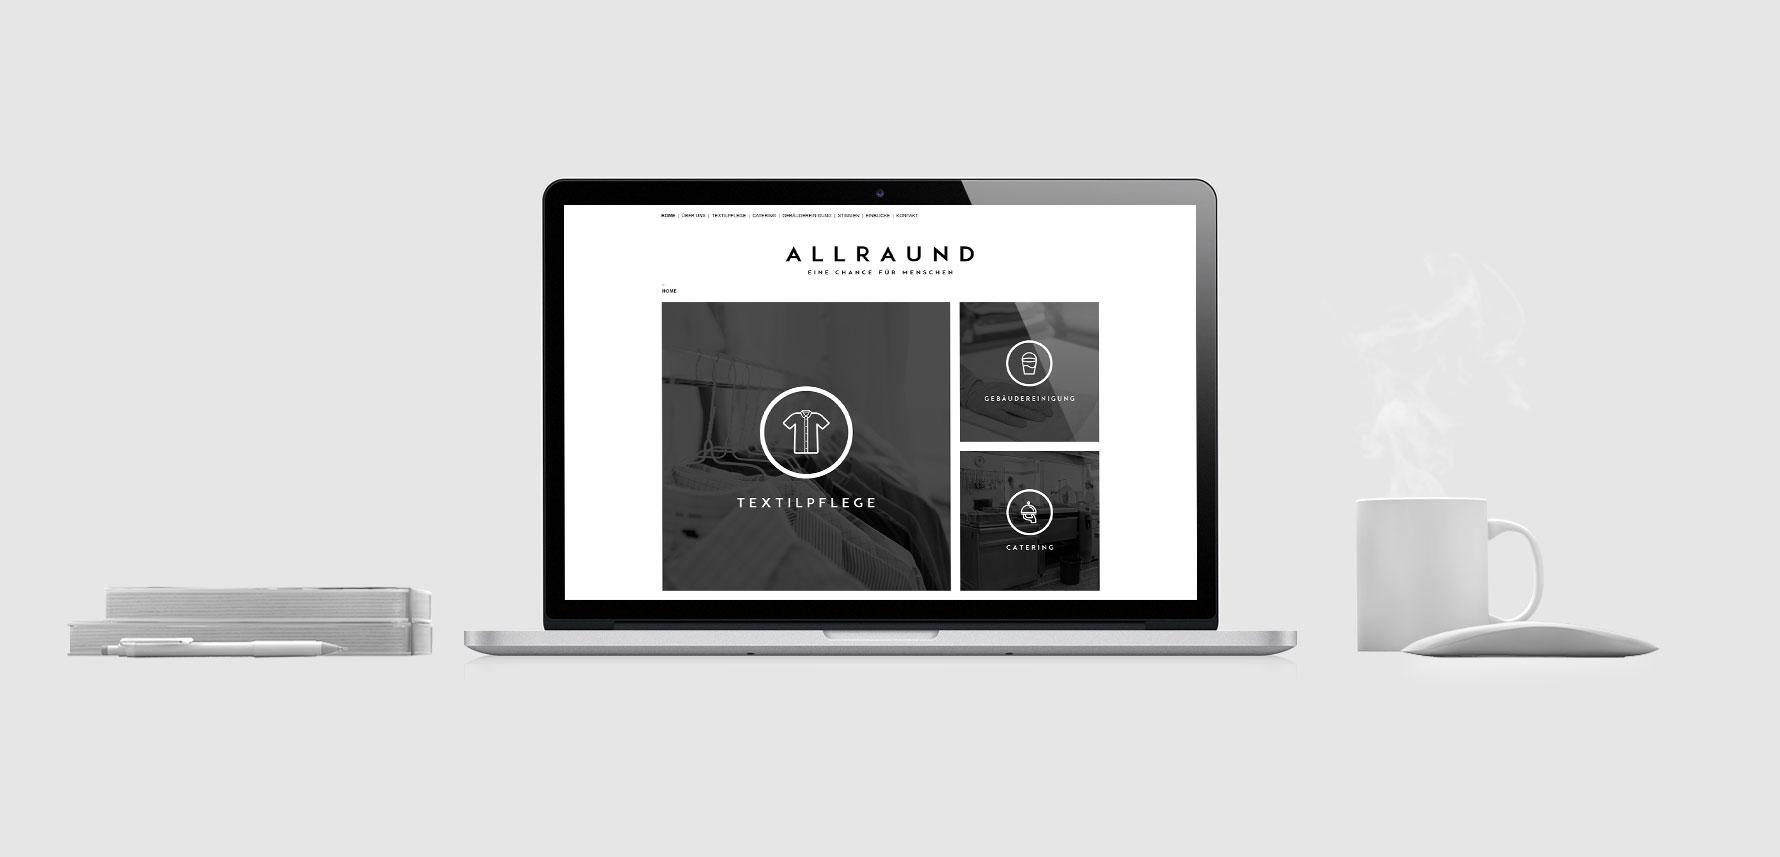 Hüfner Design | Referenz AllrAUnd gGmbH | Webdesign